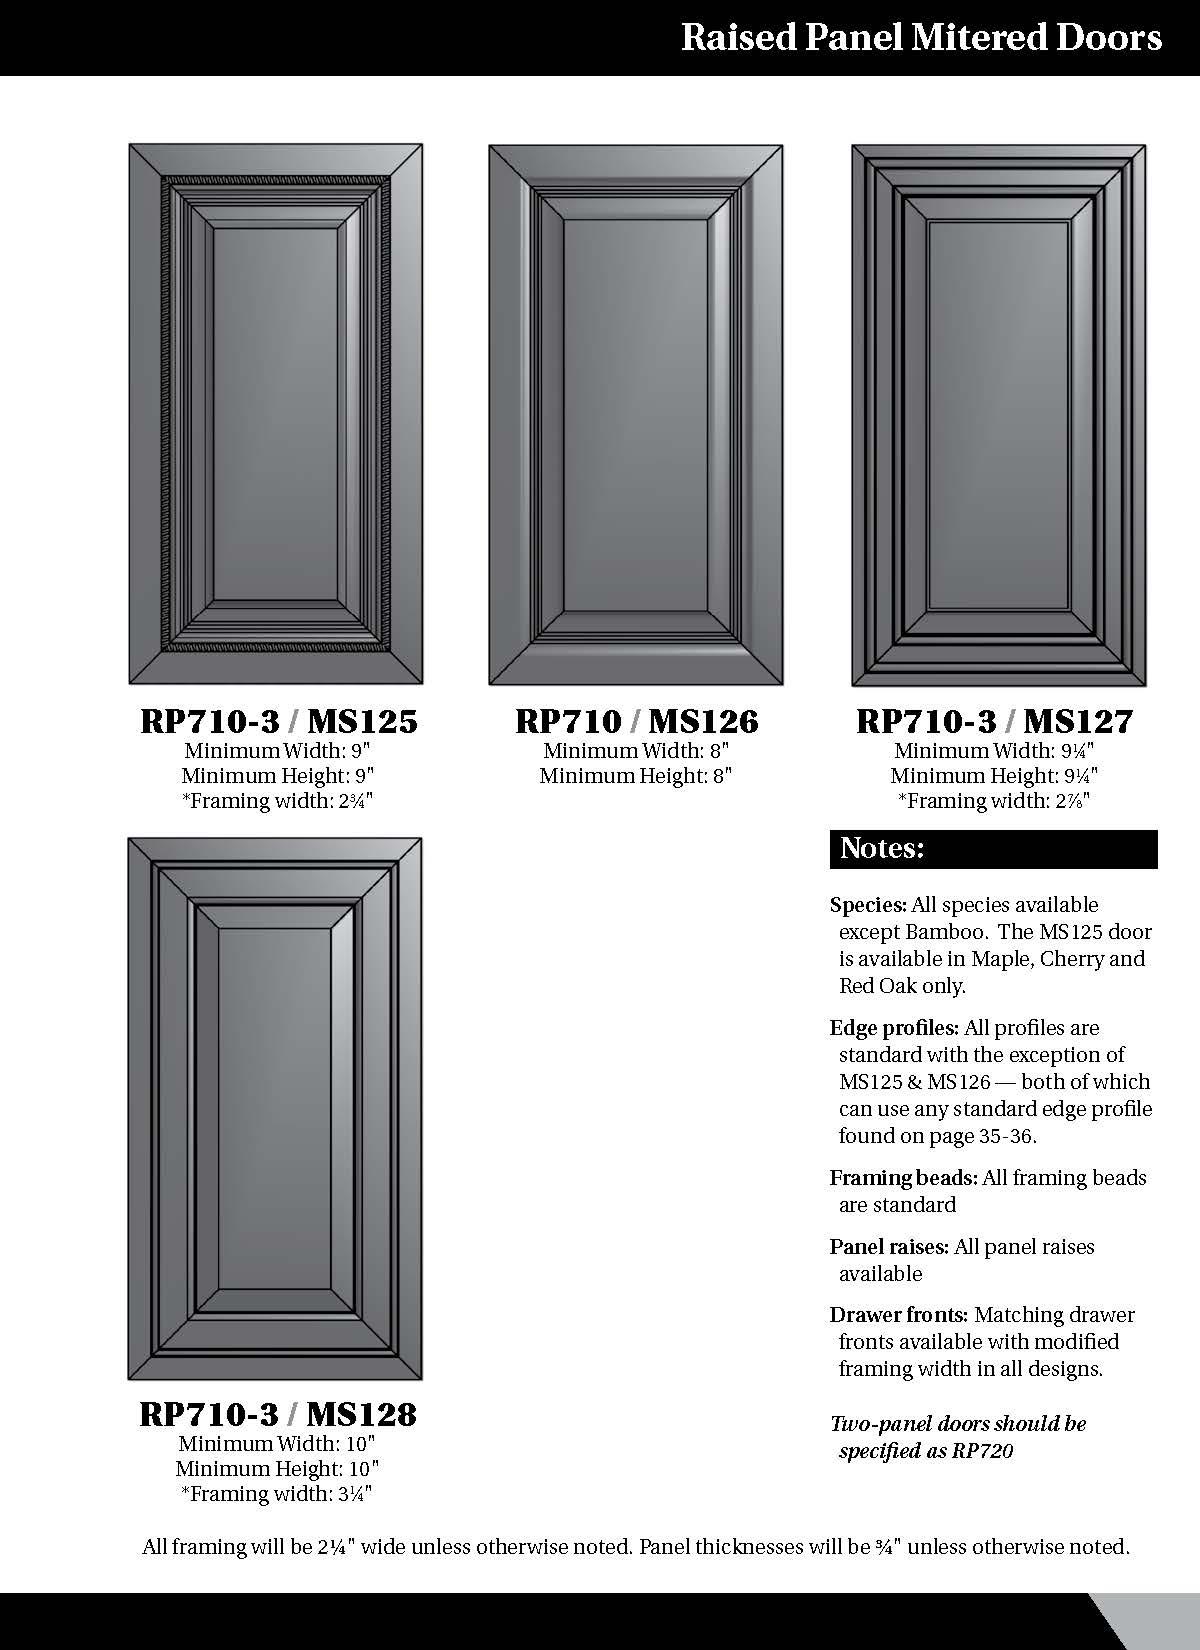 Raised-Mitered-Panel-Doors_Page_1.jpg